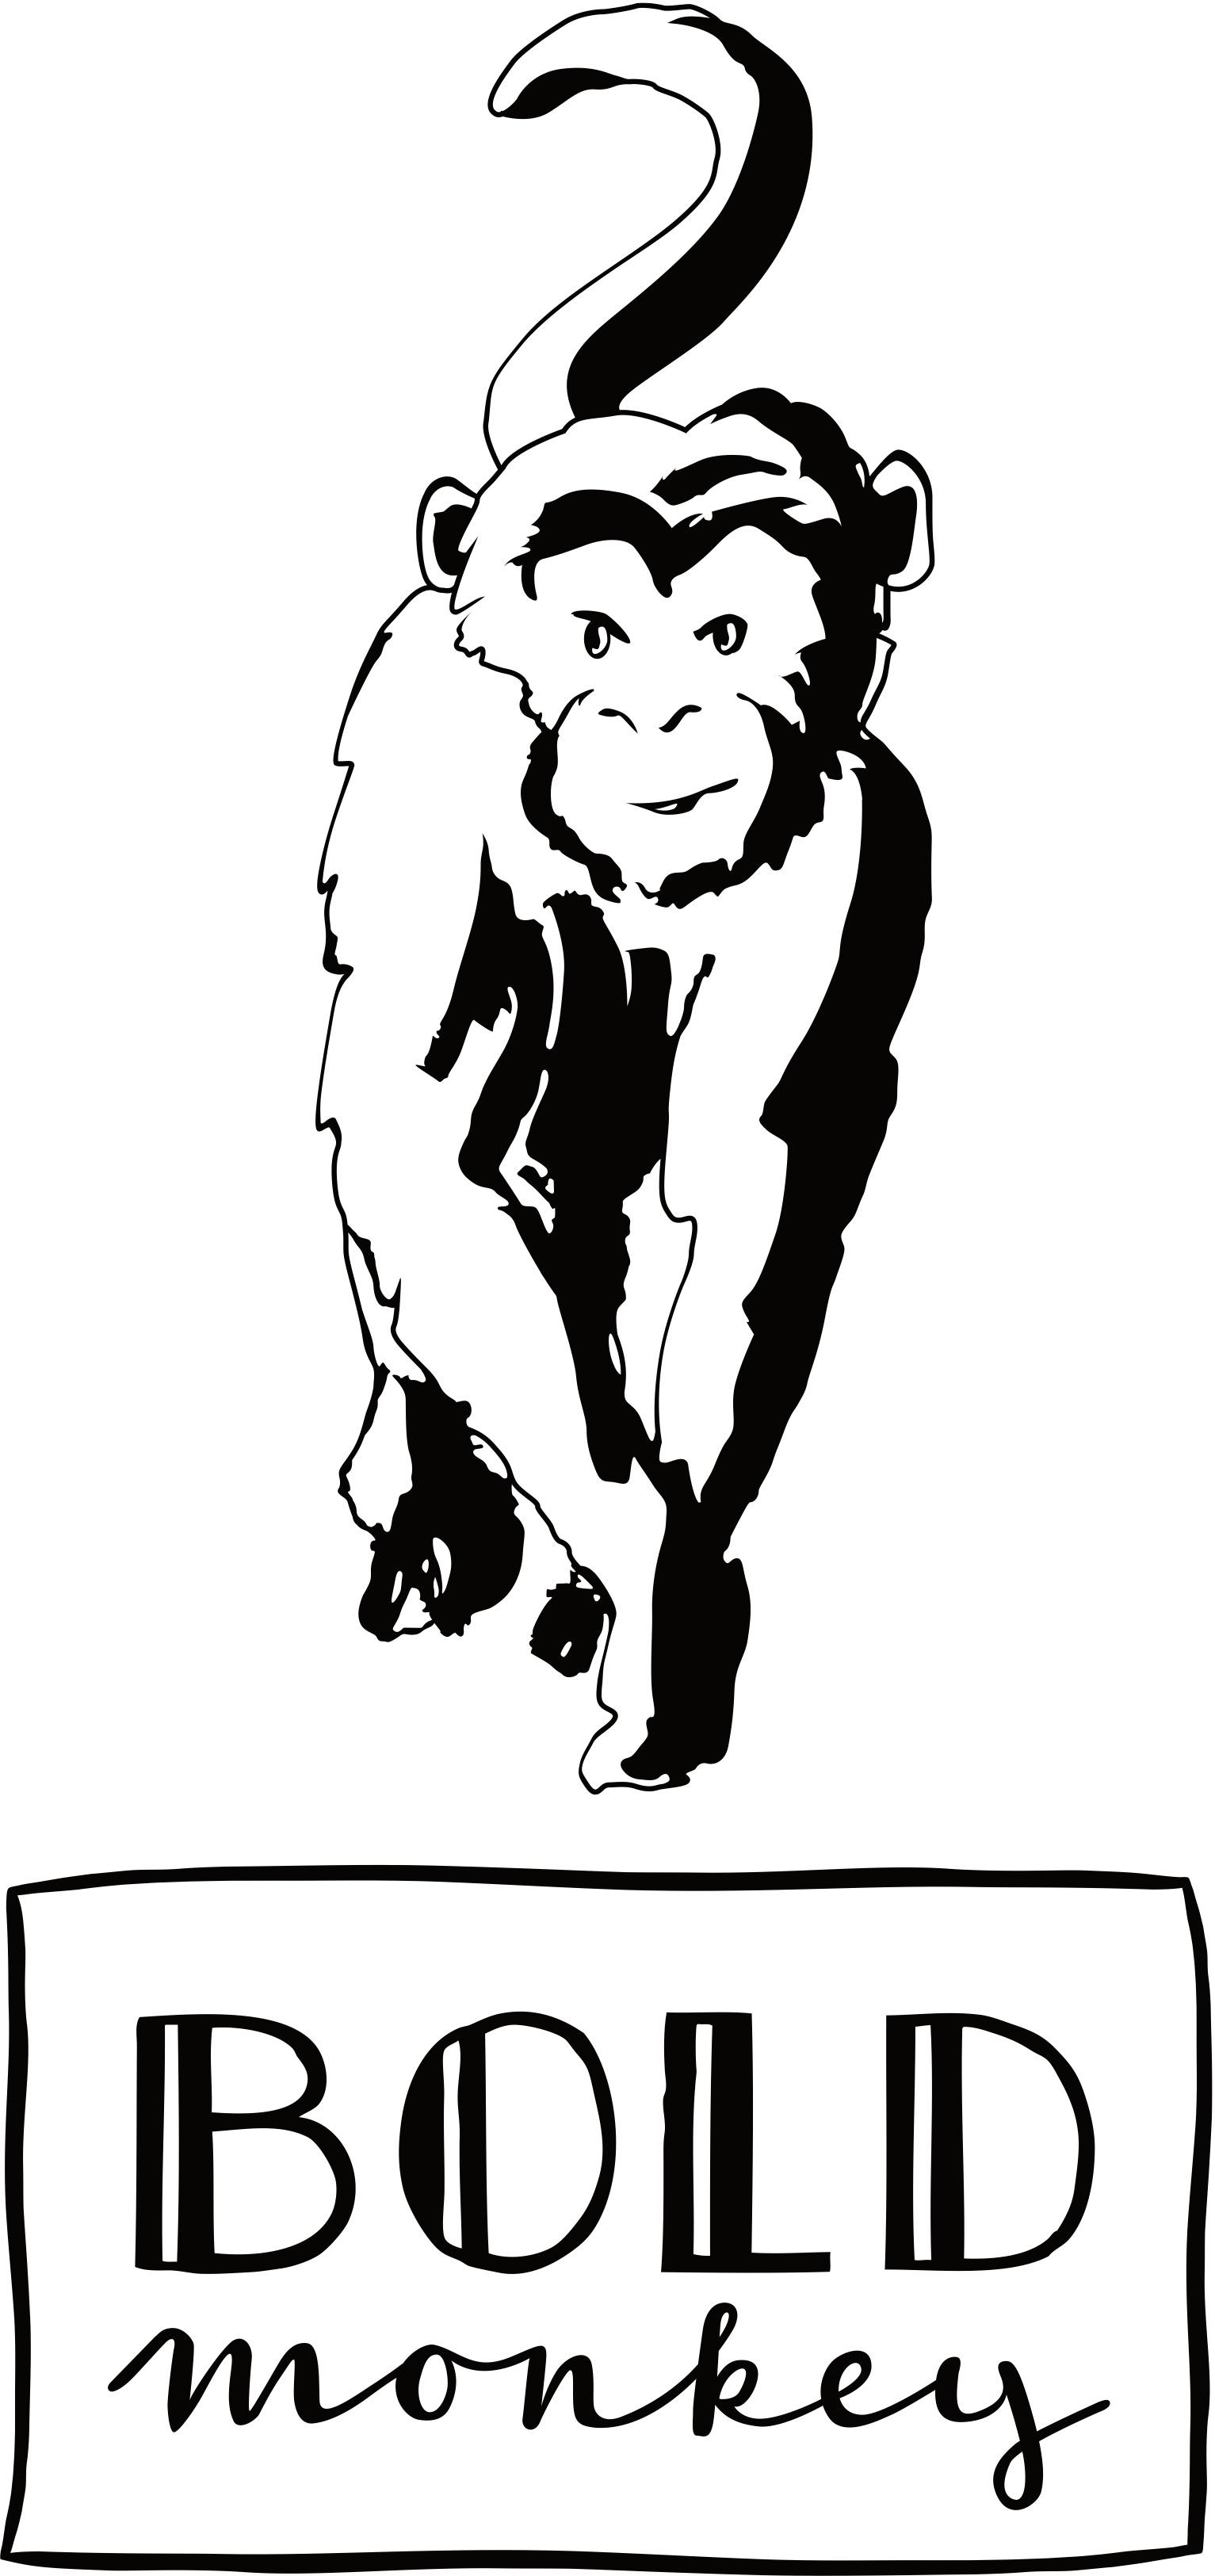 Bold MonkeyChunky footed bijzettafel goud - Design marmer bijzettafel - koper rond de bijzettafel